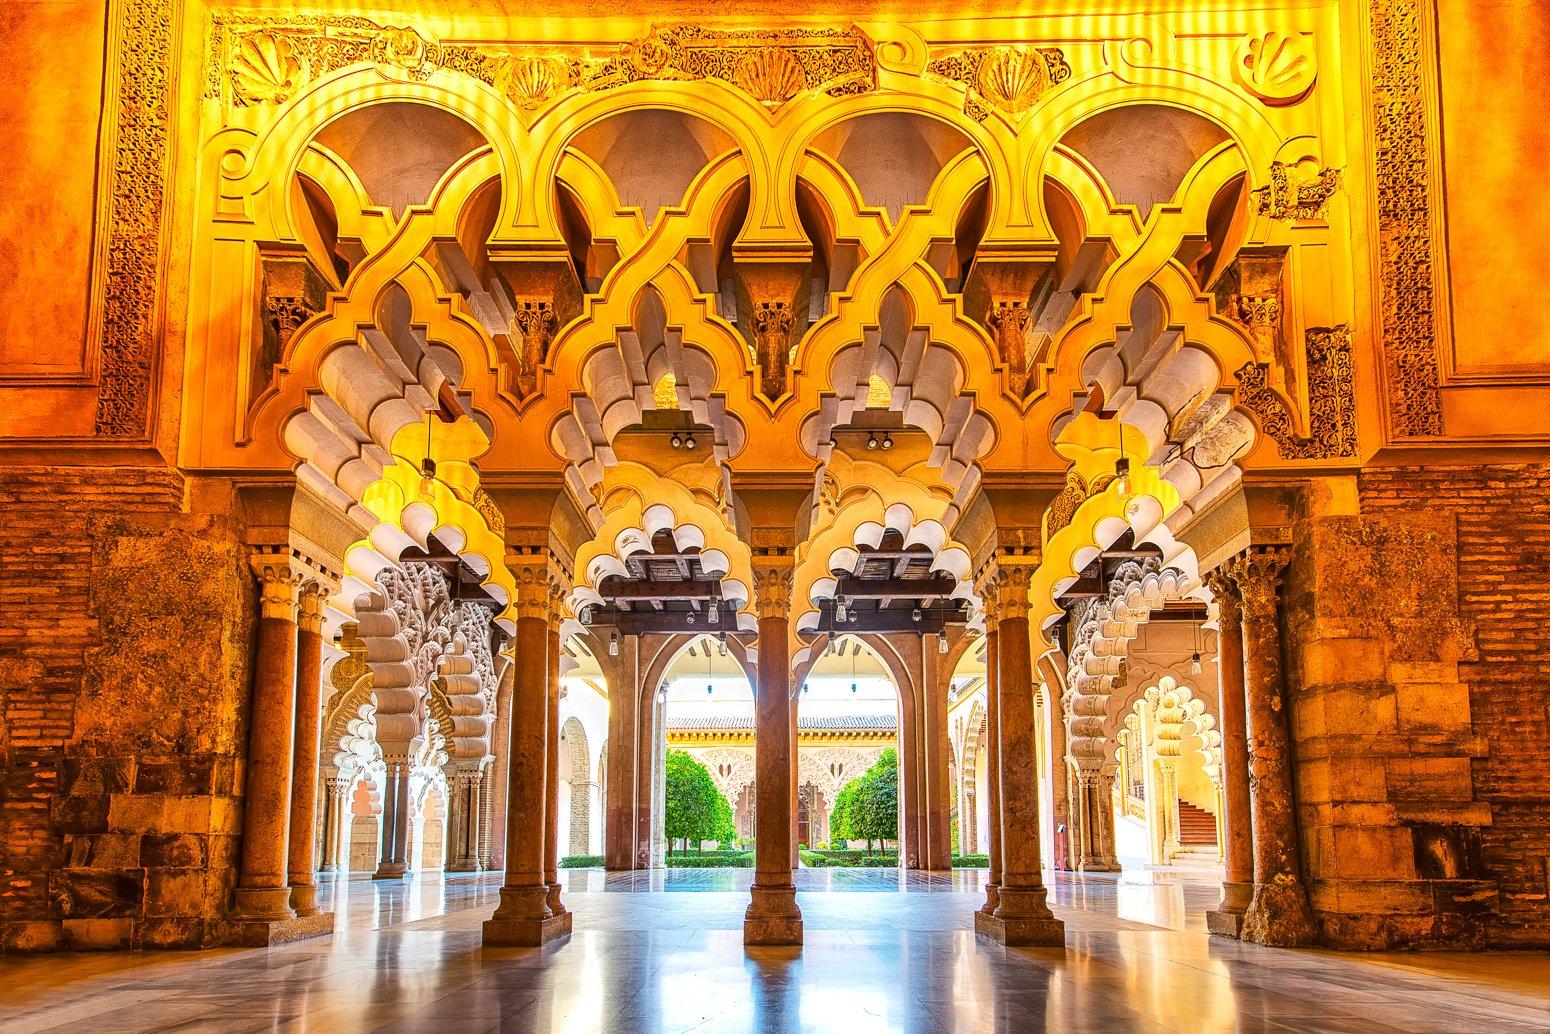 Aljaferia Paleis in Saragossa, Spanje met unieke architectuur en verschillende stijlen